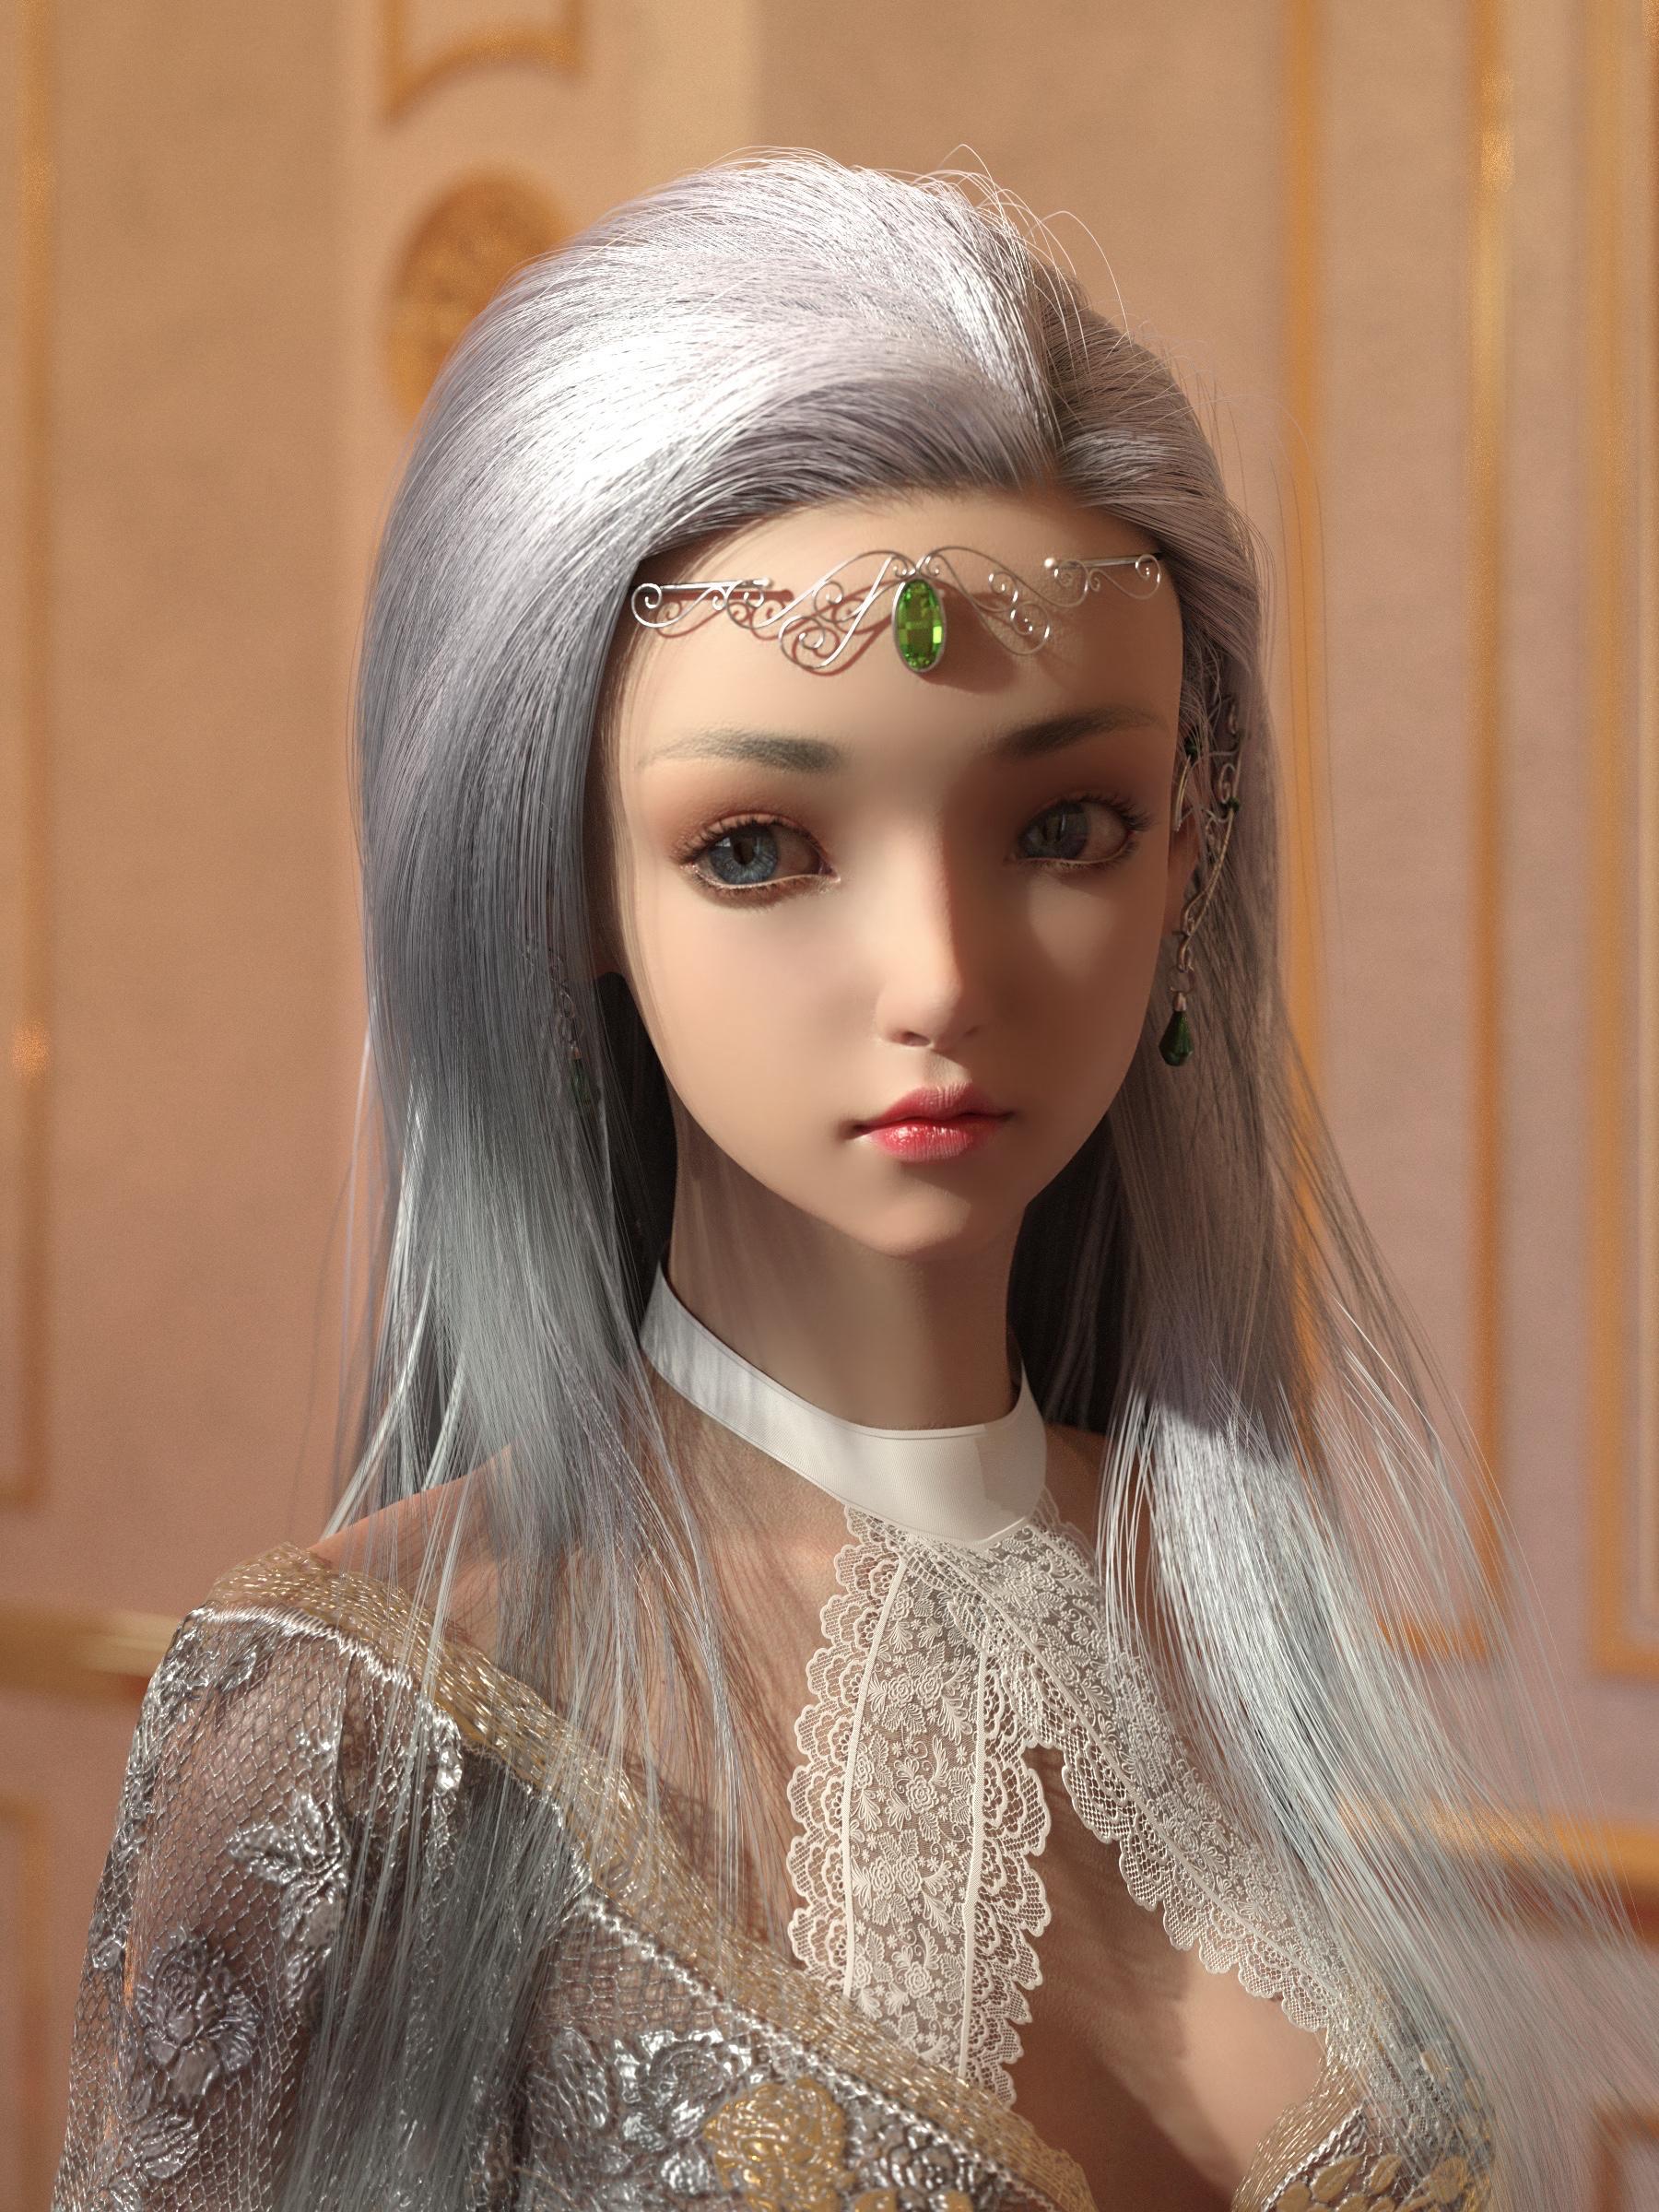 Leona for Genesis 8.1 Female by: Ergou, 3D Models by Daz 3D